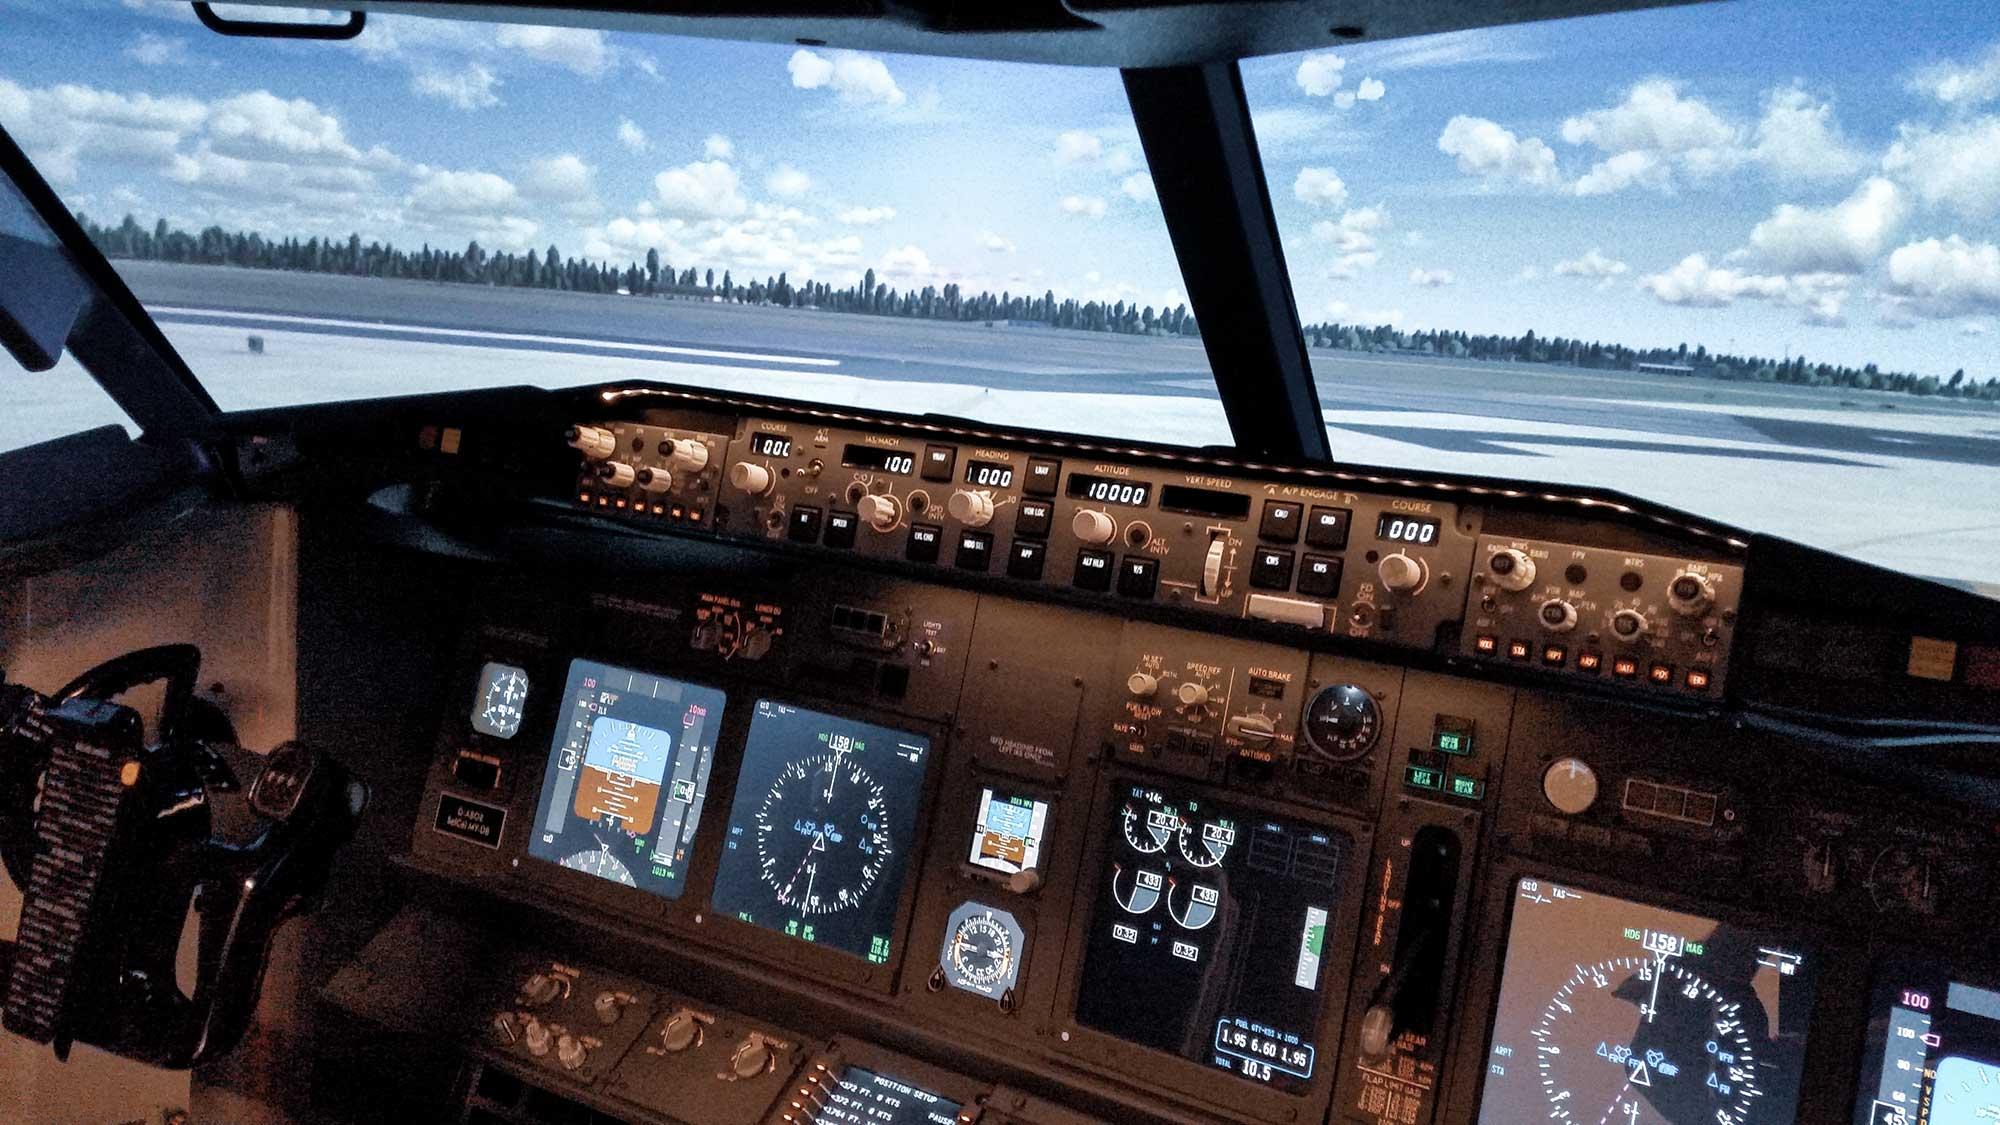 VERUM GmbH - Flugsimulator- Fact Feel Fly- view my Cockpit